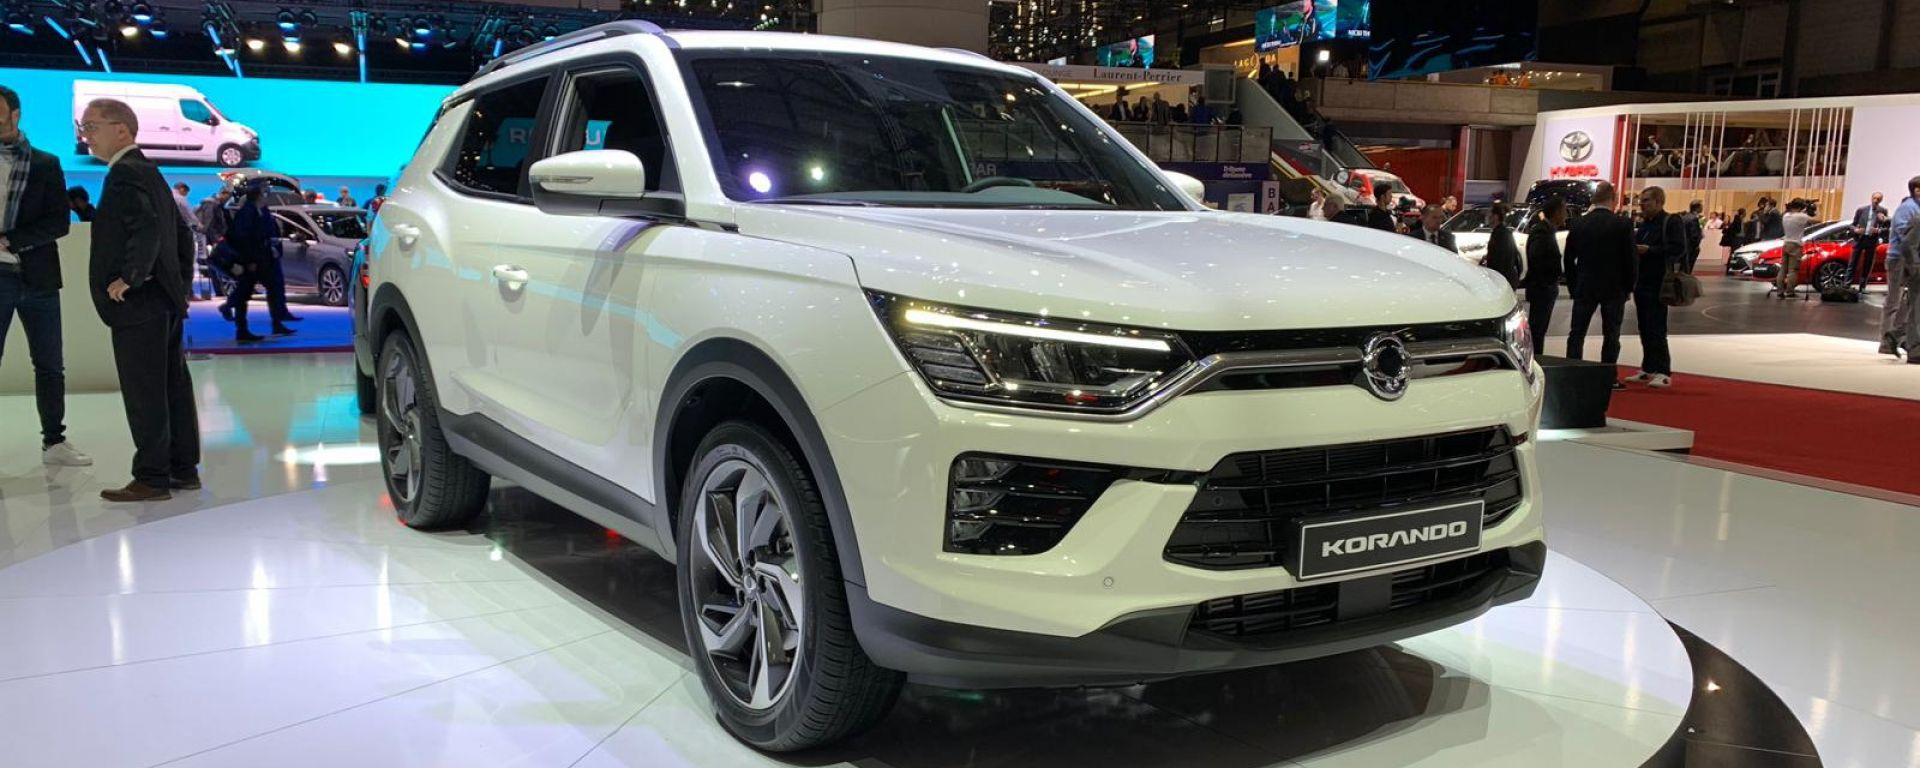 Ssangyong Korando 2019: a Ginevra sfida la Nissan Qashqai